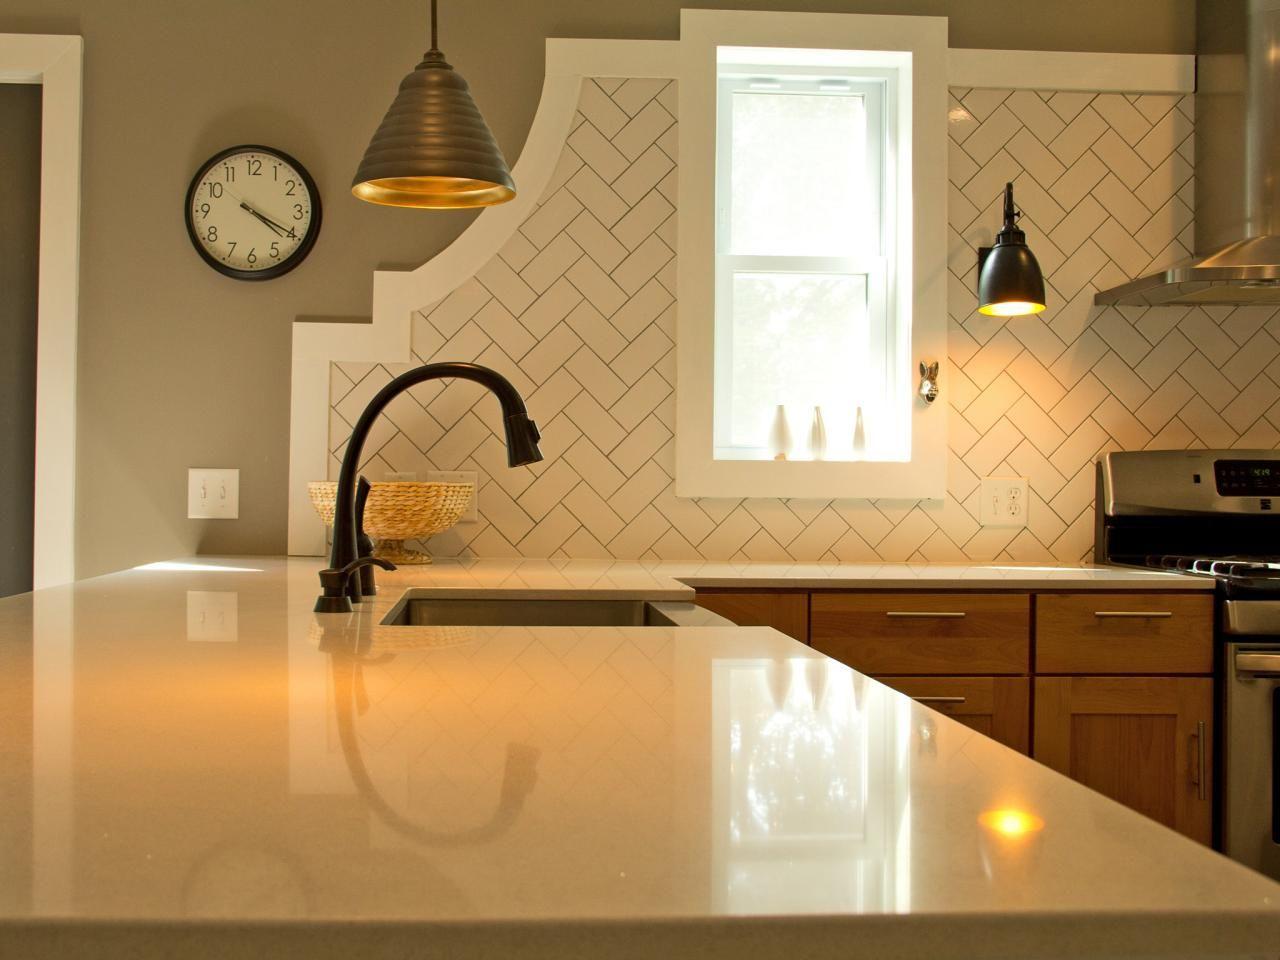 kitchen backsplash patterns design cheap 30 trendiest materials subway tile